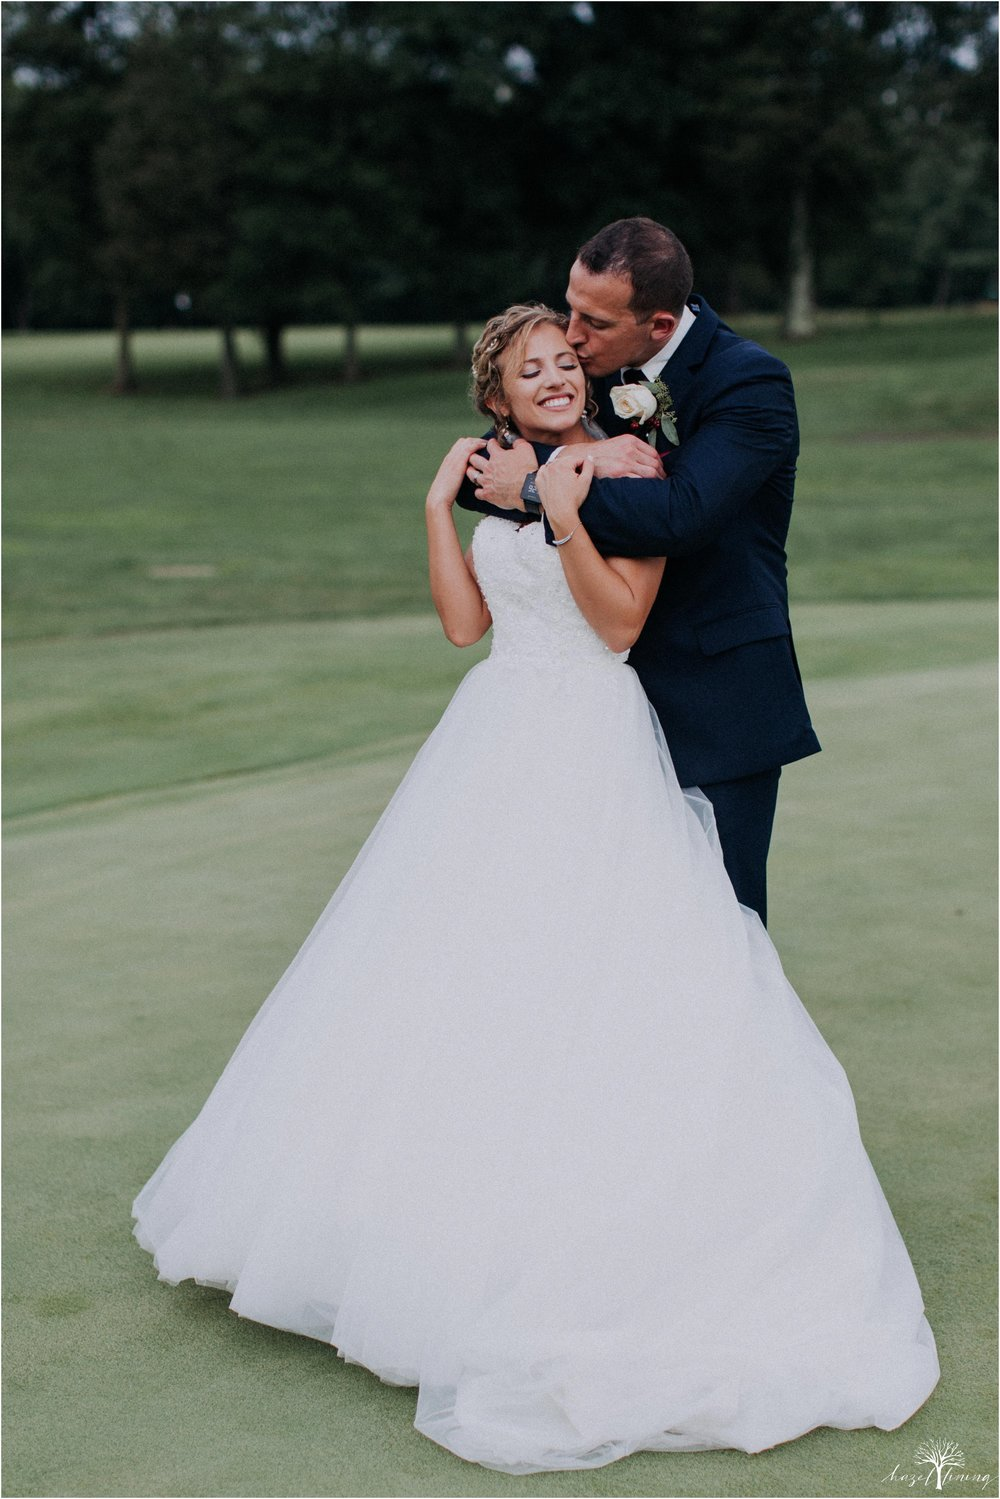 jonathan-weibel-becky-haywood-loft-at-sweetwater-cc-pennsburg-pennsylvania-rainy-day-summer-wedding-hazel-lining-travel-wedding-elopement-photography_0087.jpg